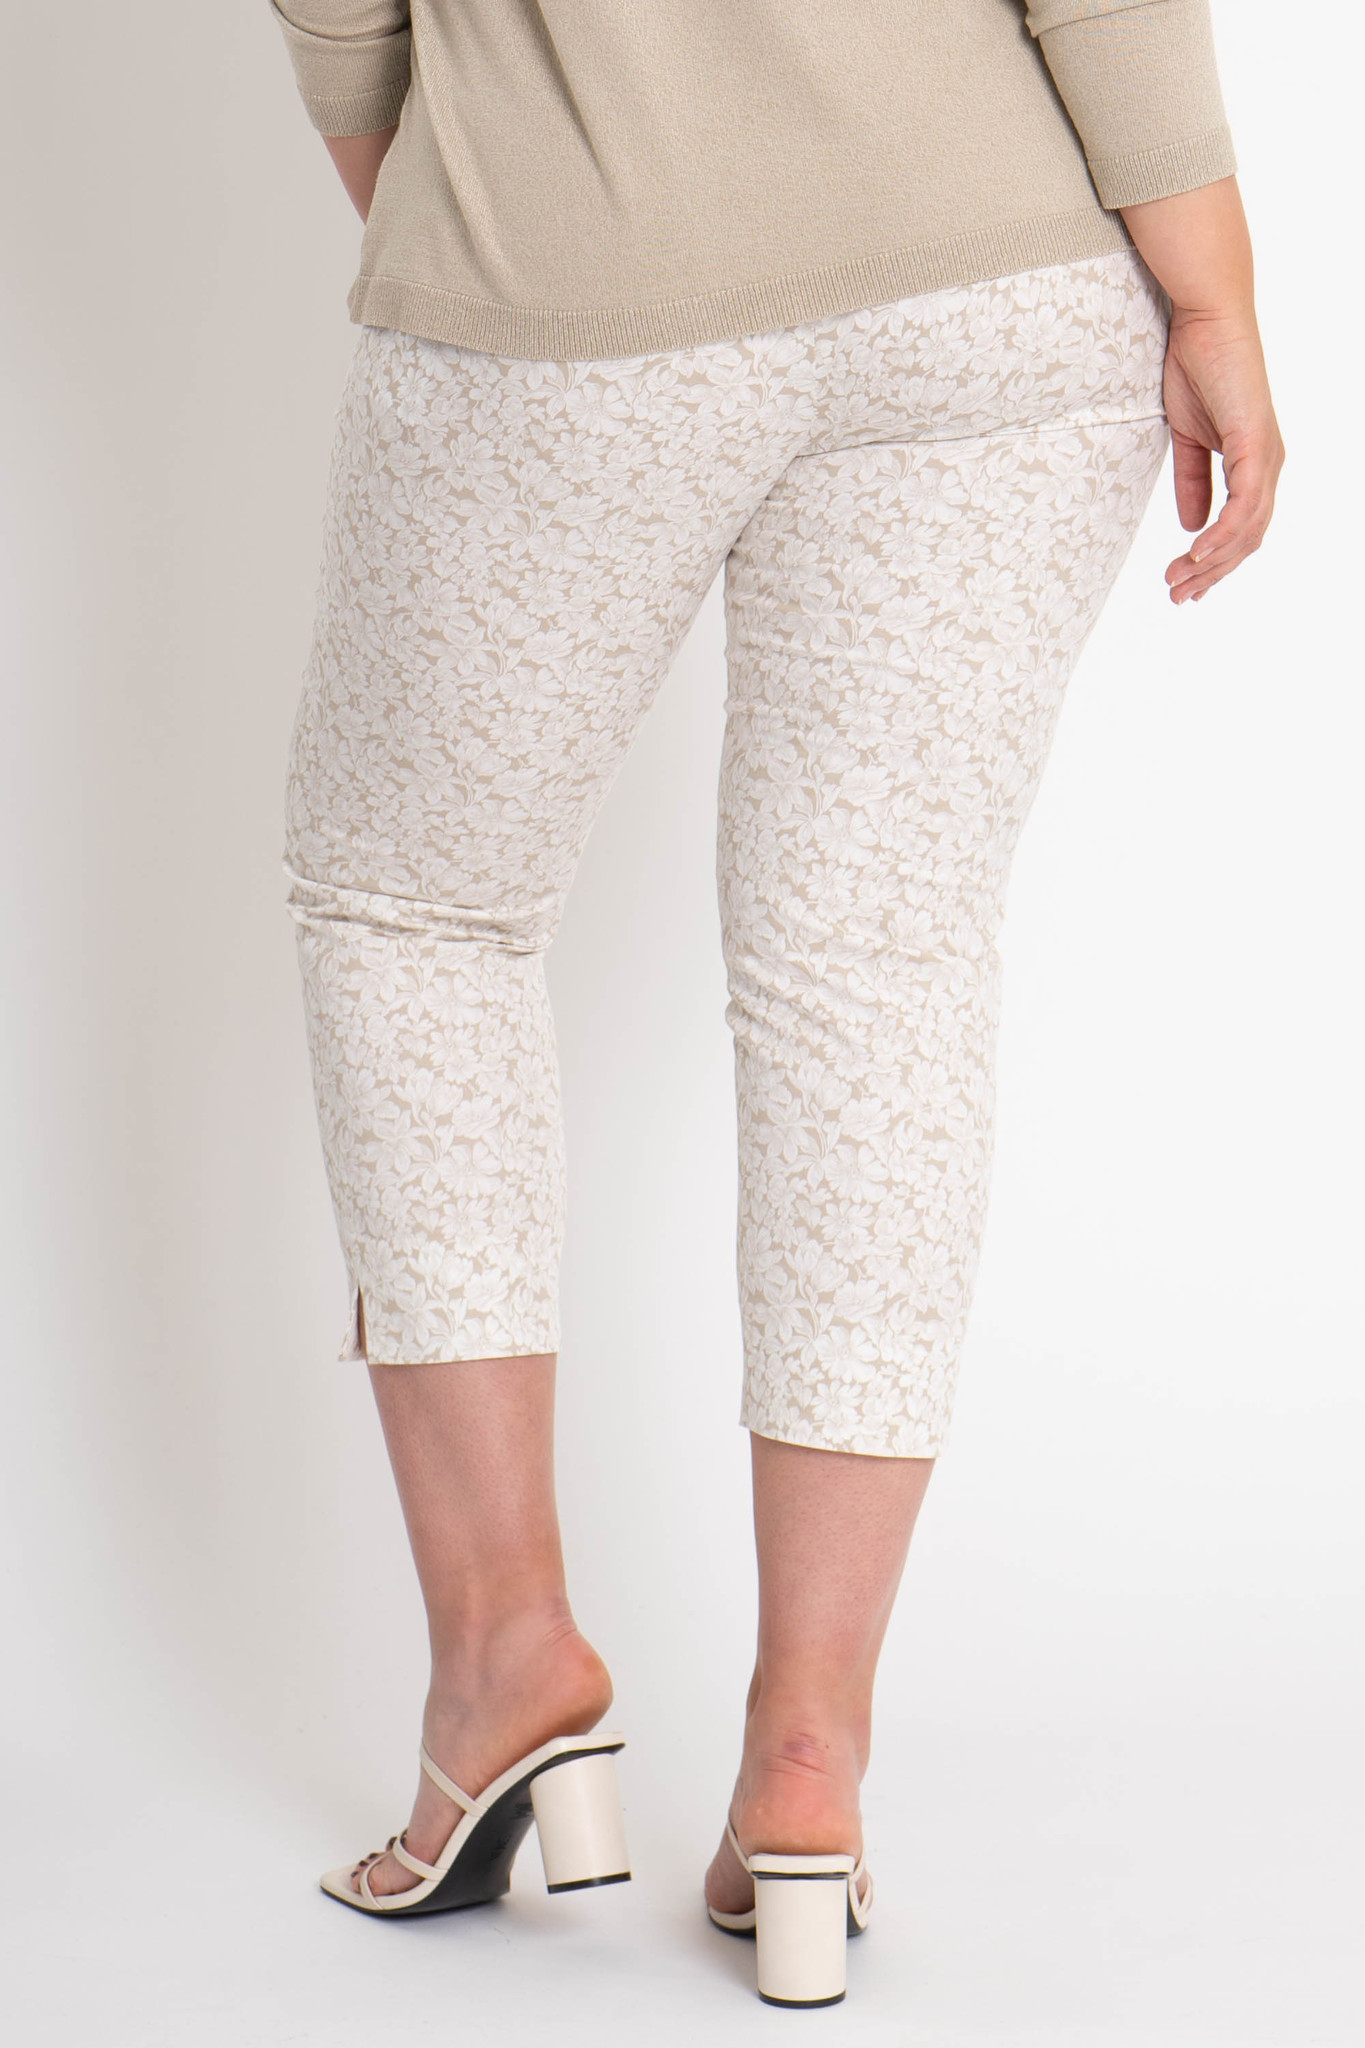 CAPRI Trousers in Cotton stretch-3